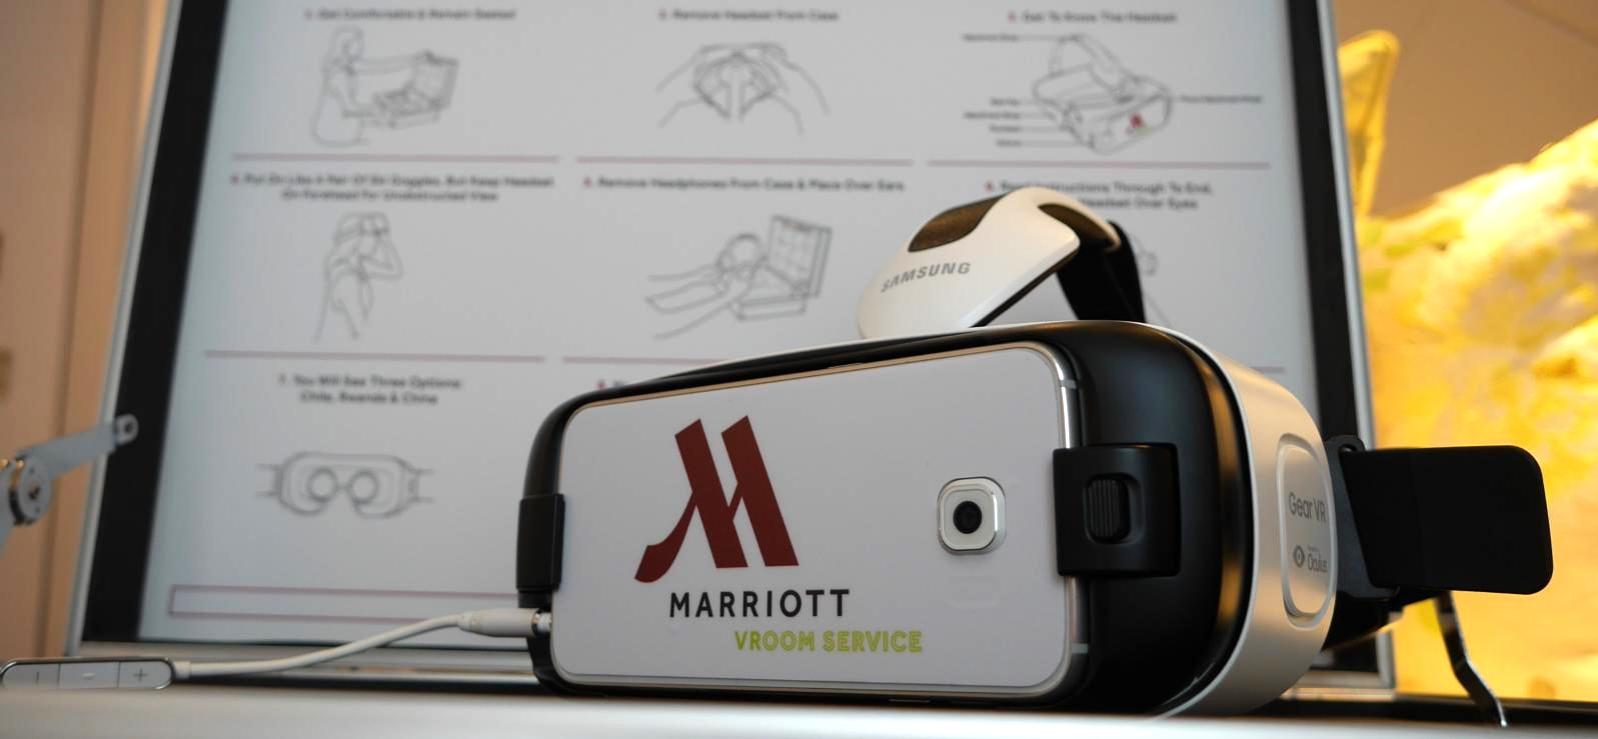 VRPostcards_Marriott_Image22.jpg